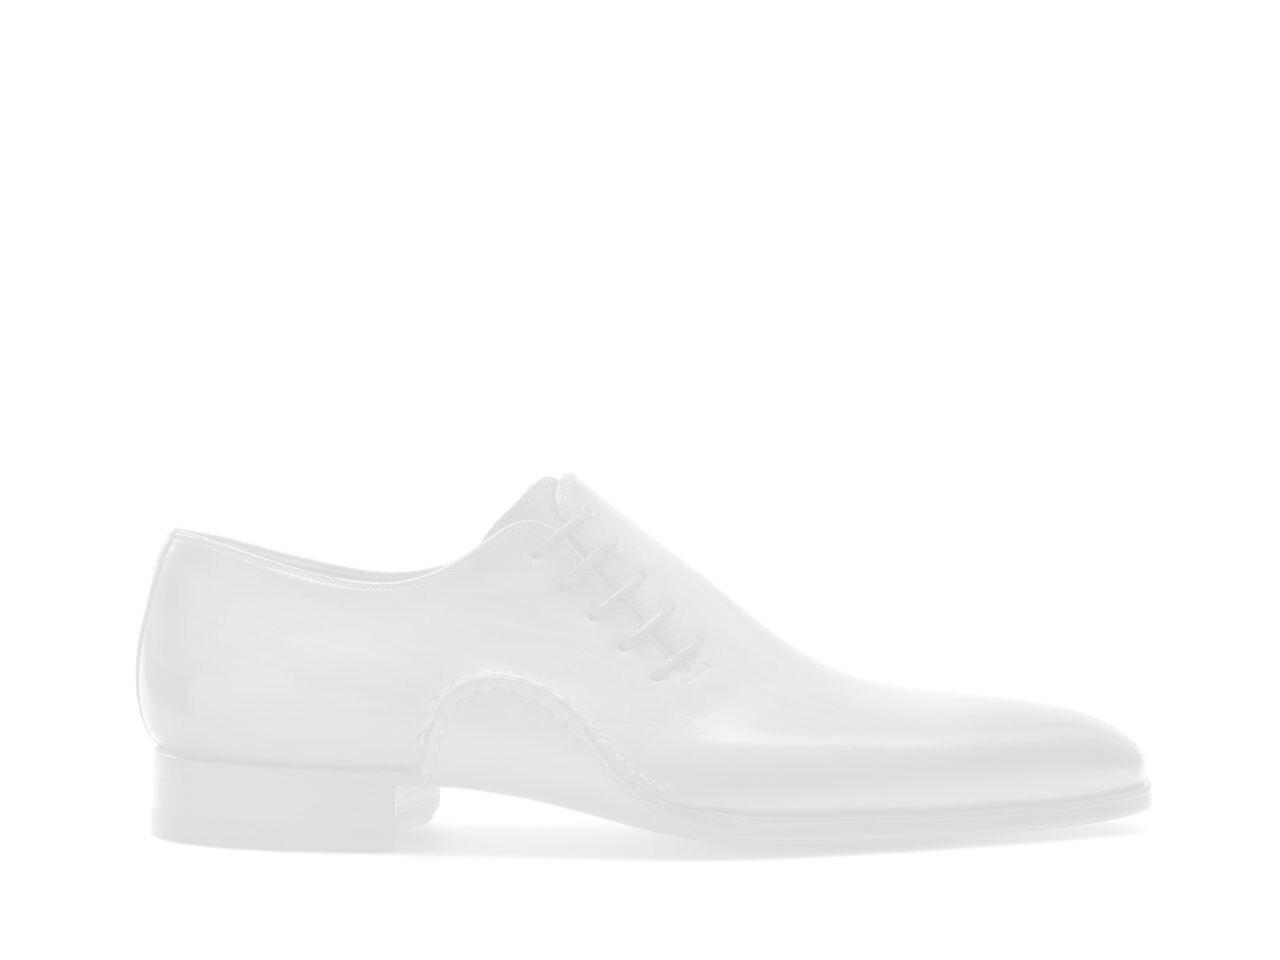 Pair of the Magnanni Meira Black Men's Single Monk Strap Shoes